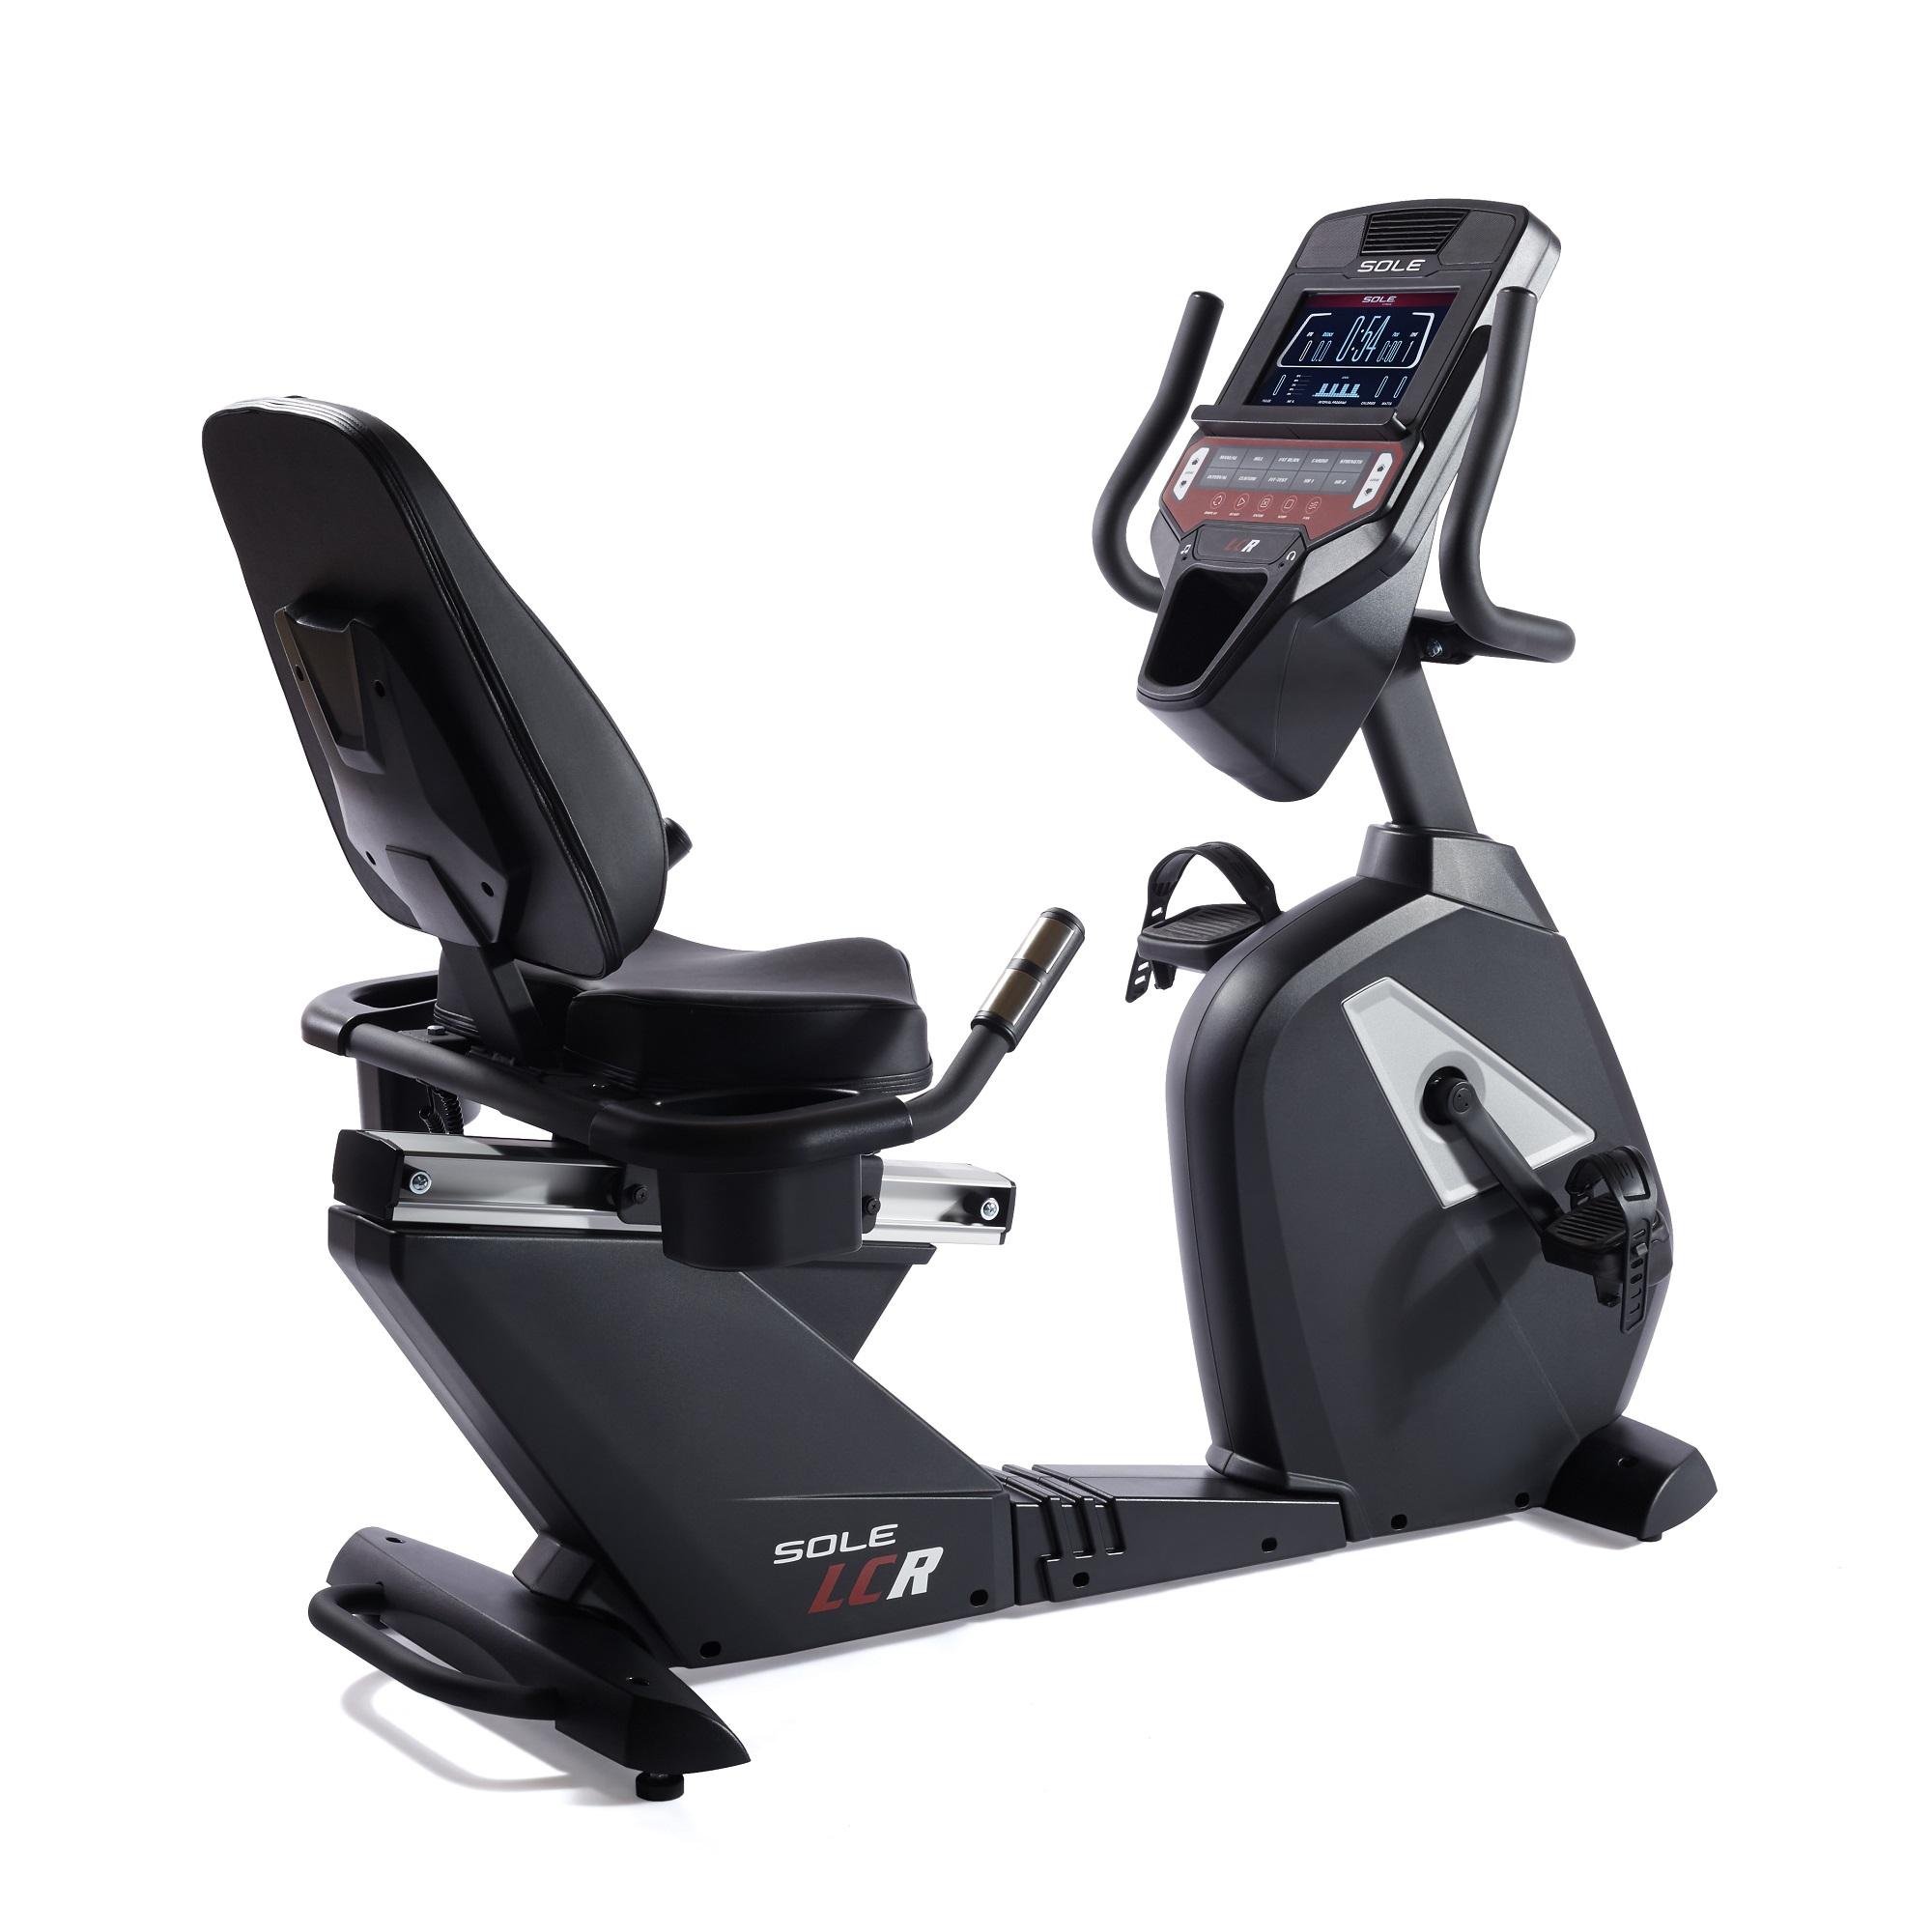 Sole Fitness LCR Ligfiets - Gratis trainingsschema